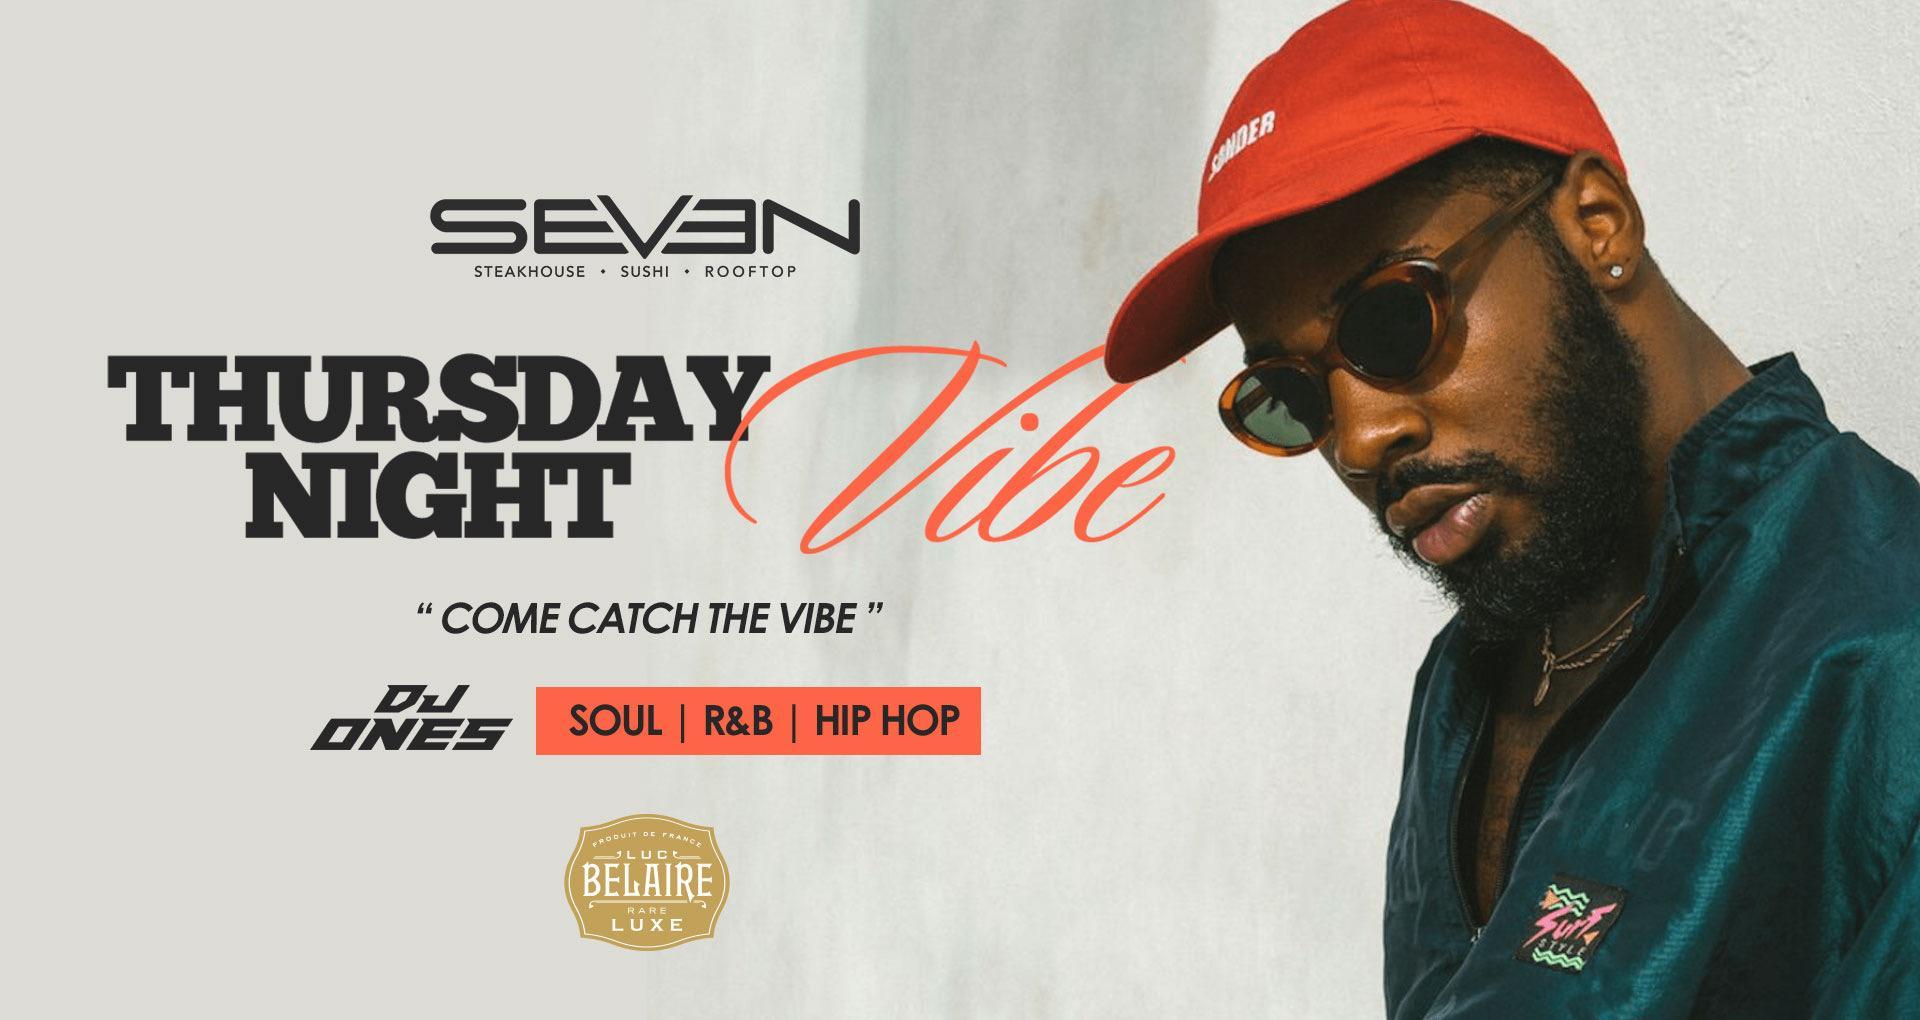 Thursday Night Vibe